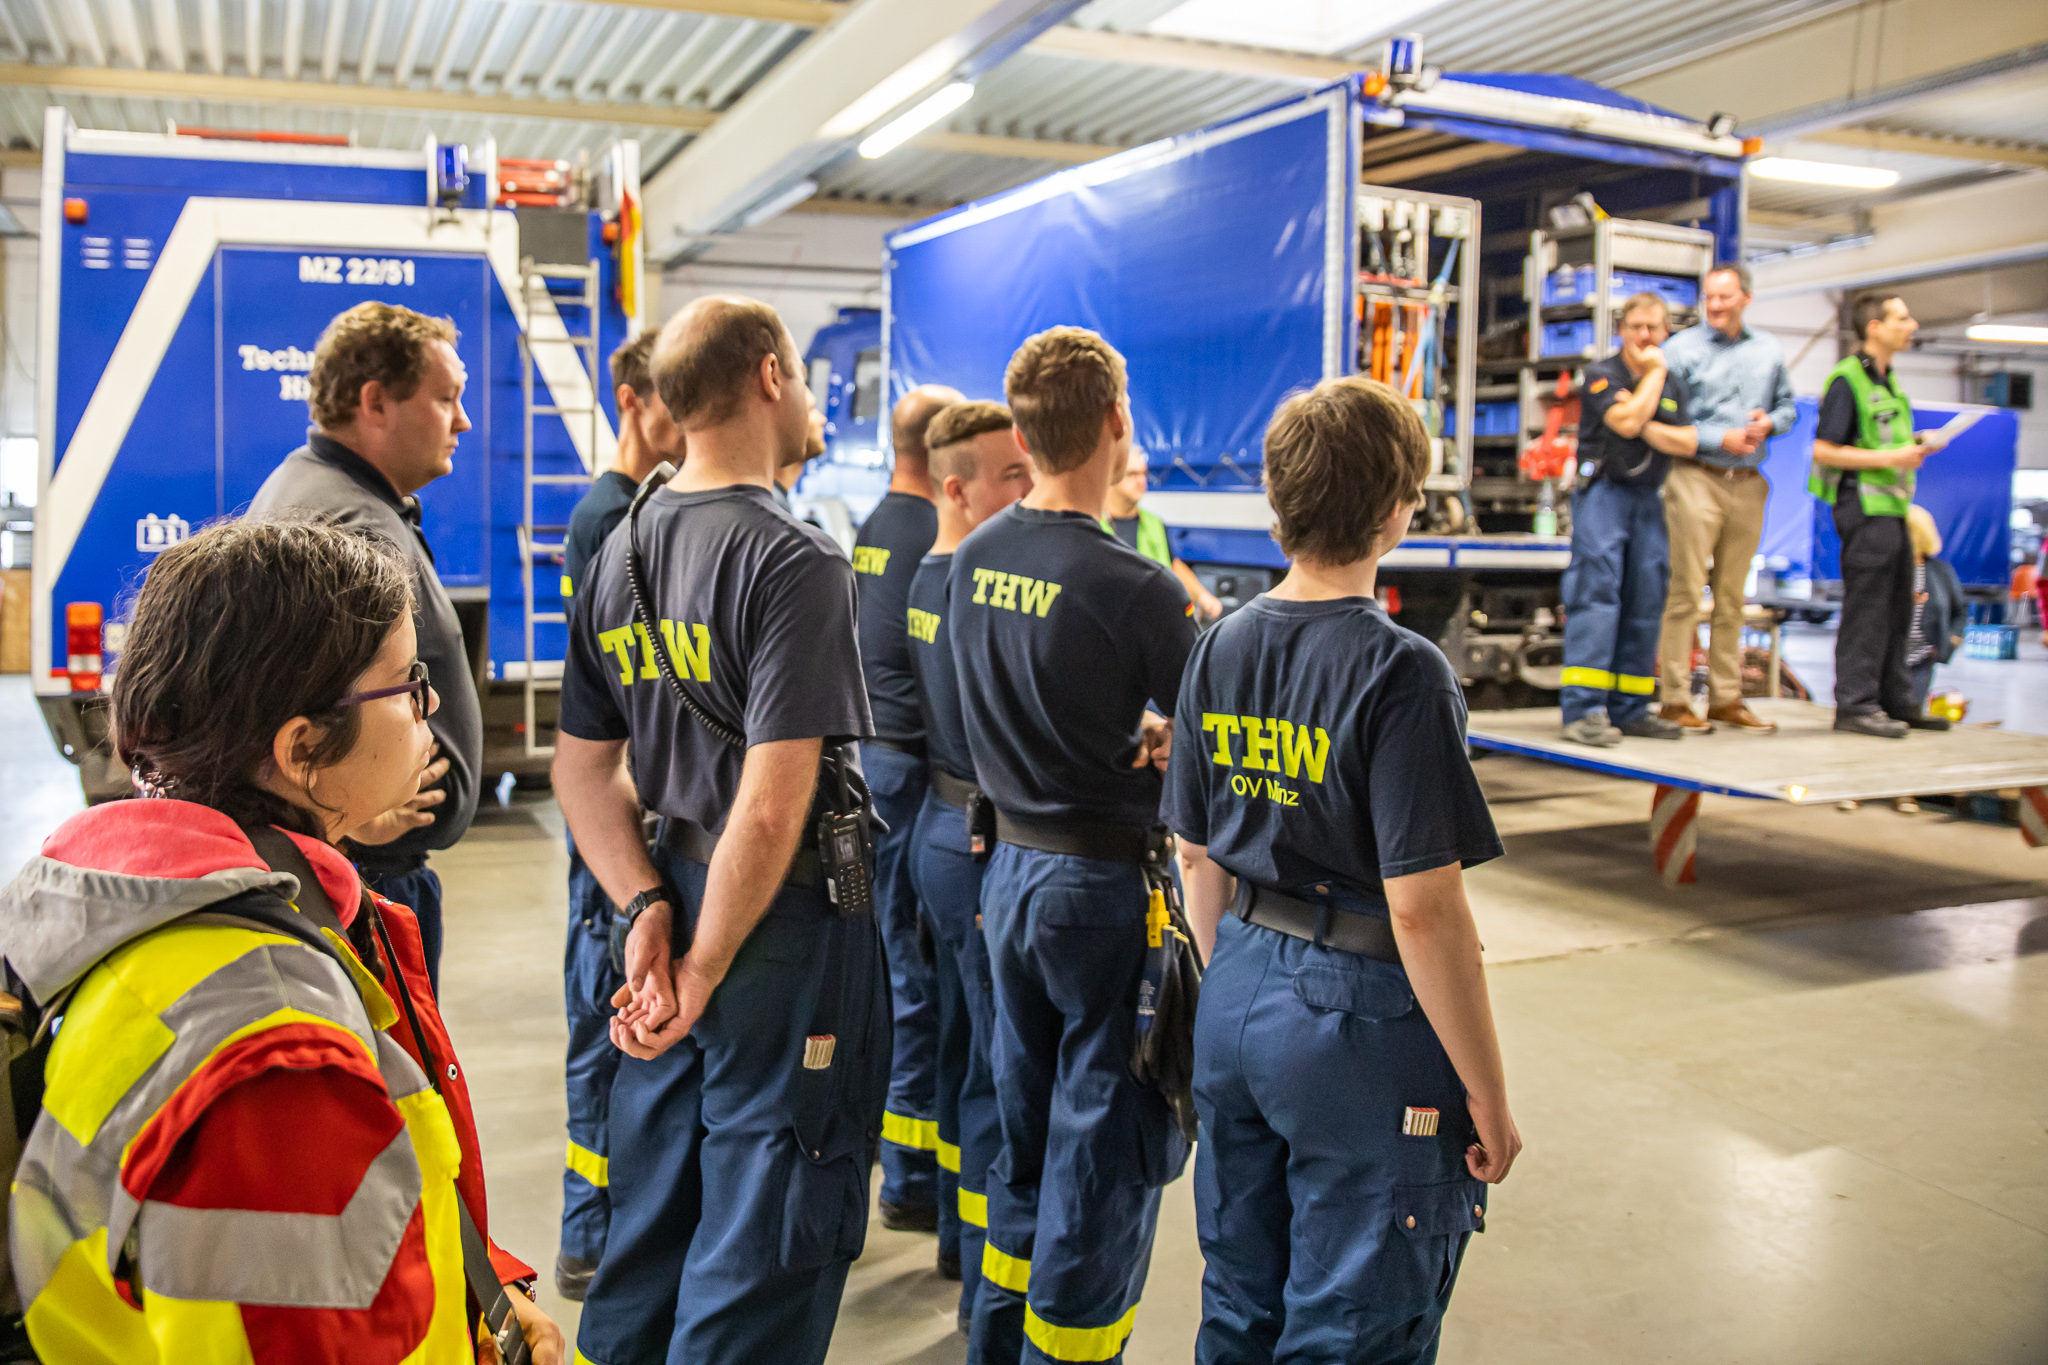 FeuerwehrSim 2019 Begrung-3